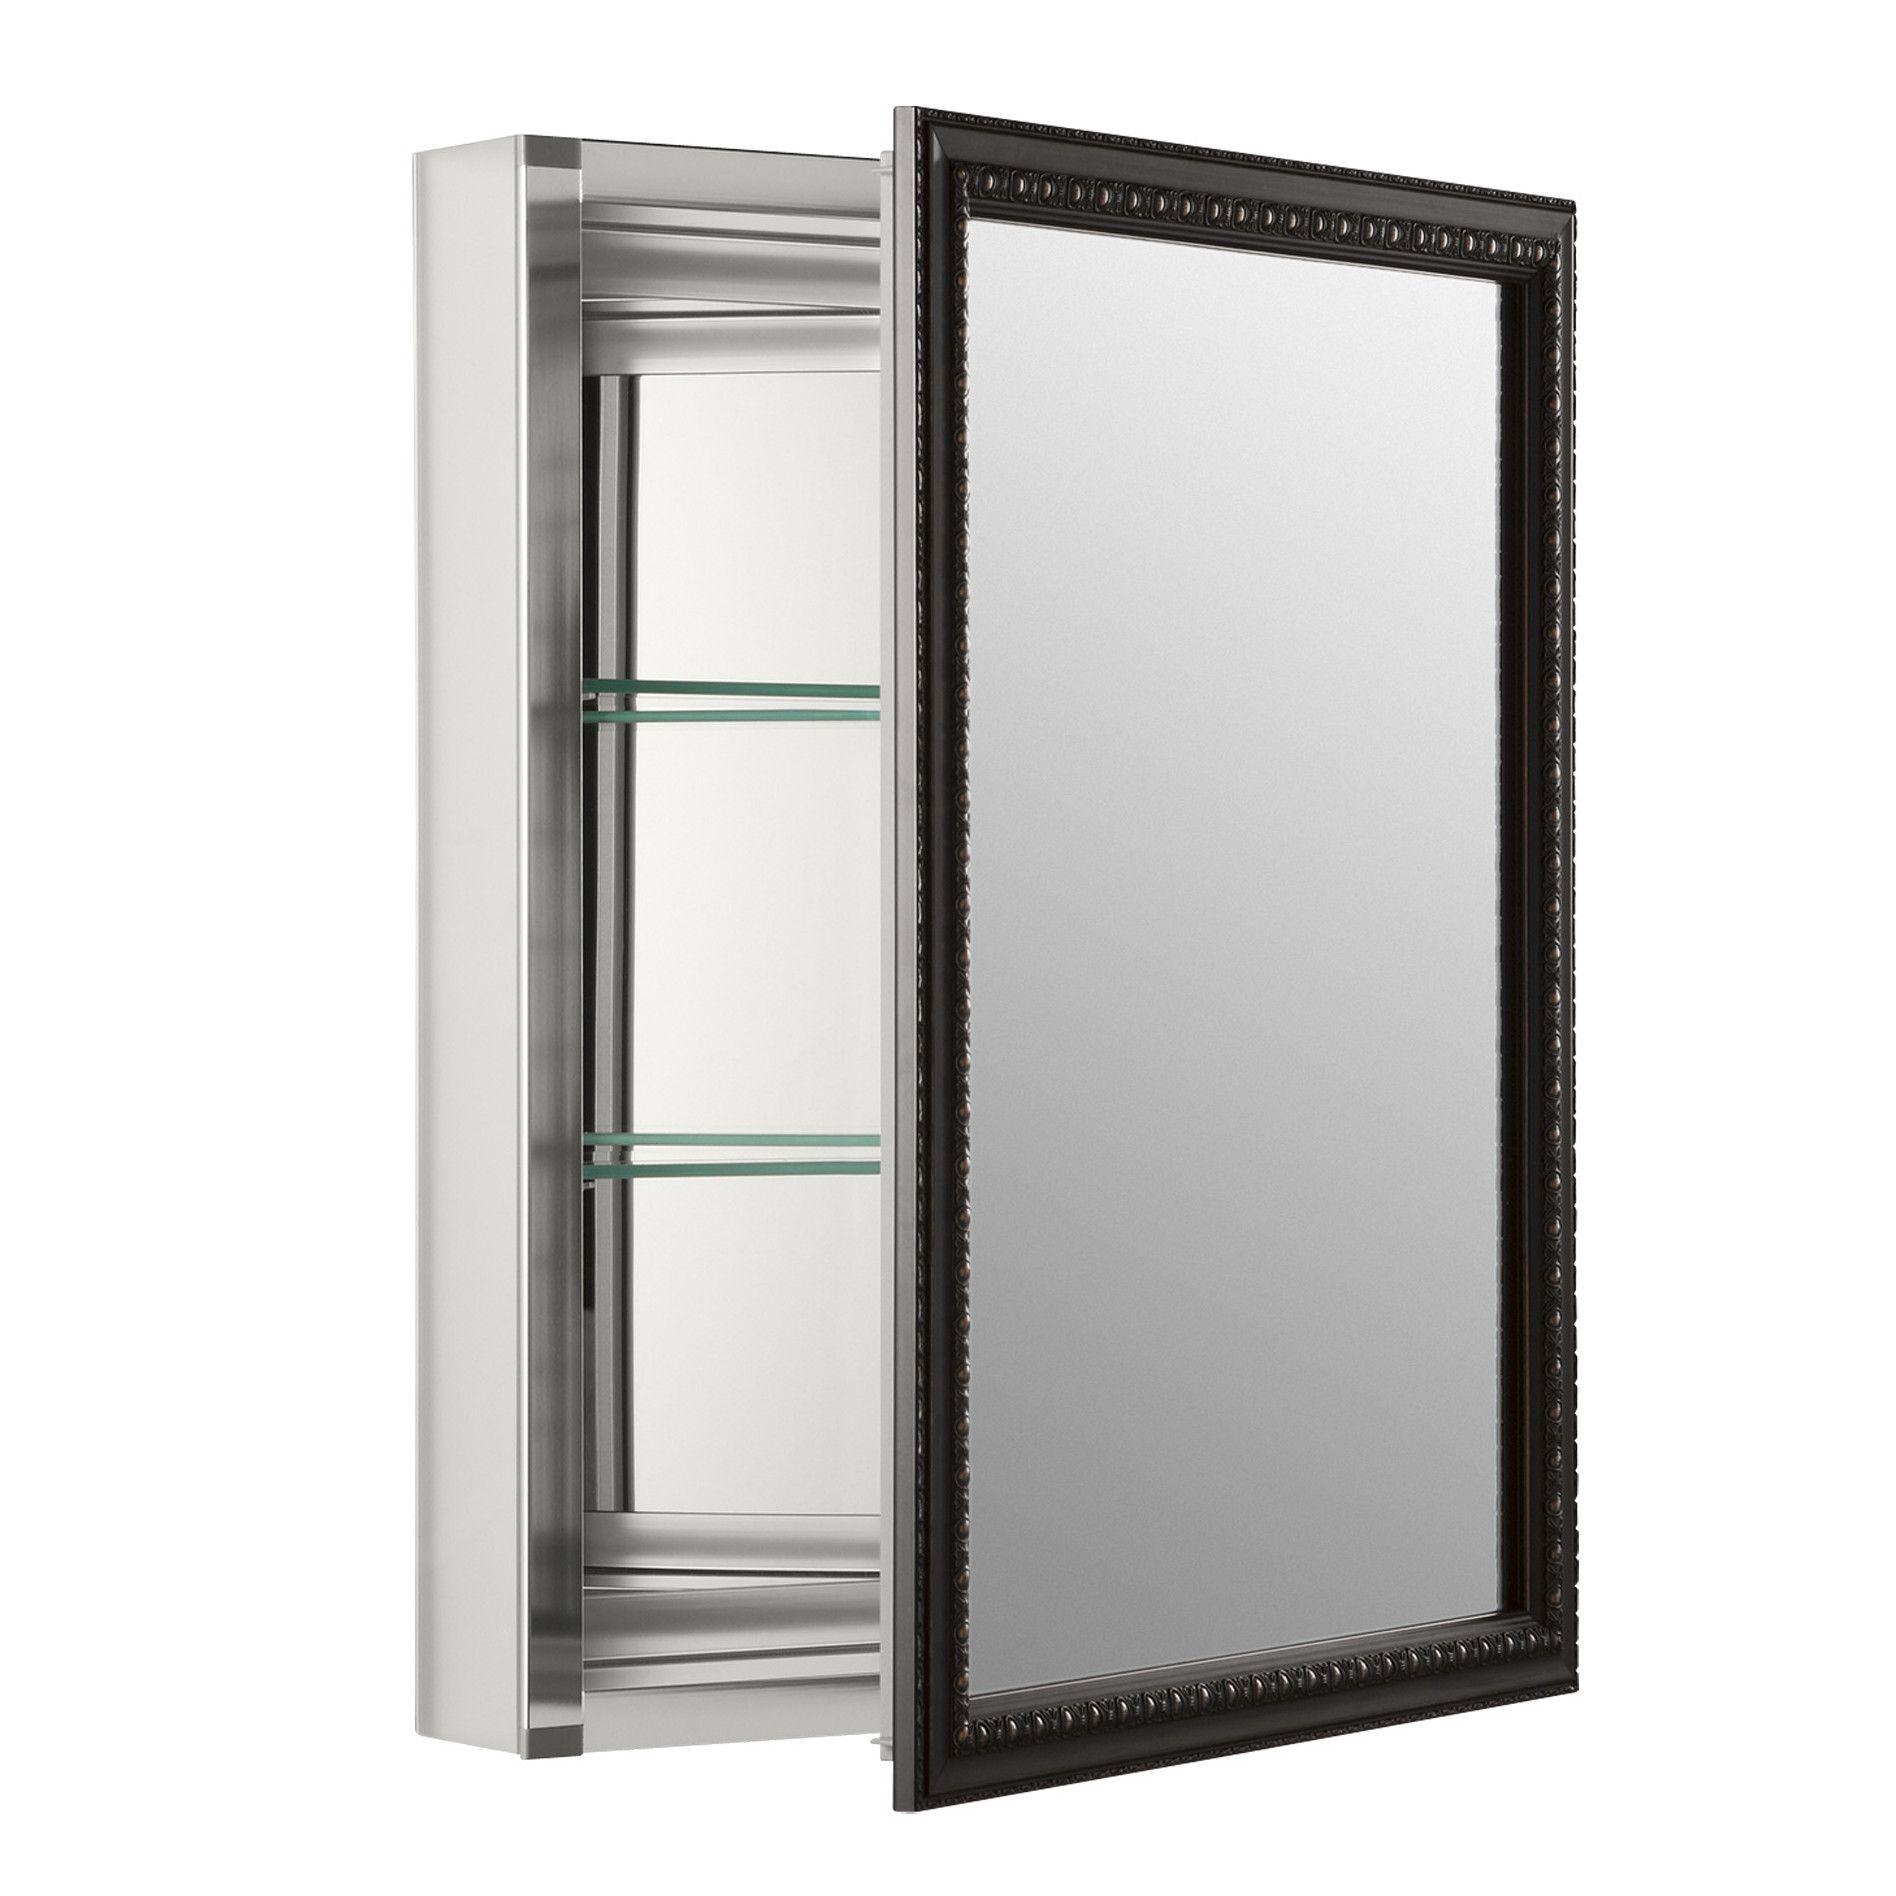 Recessed Or Surface Mount Framed 1 Door Medicine Cabinet With 2